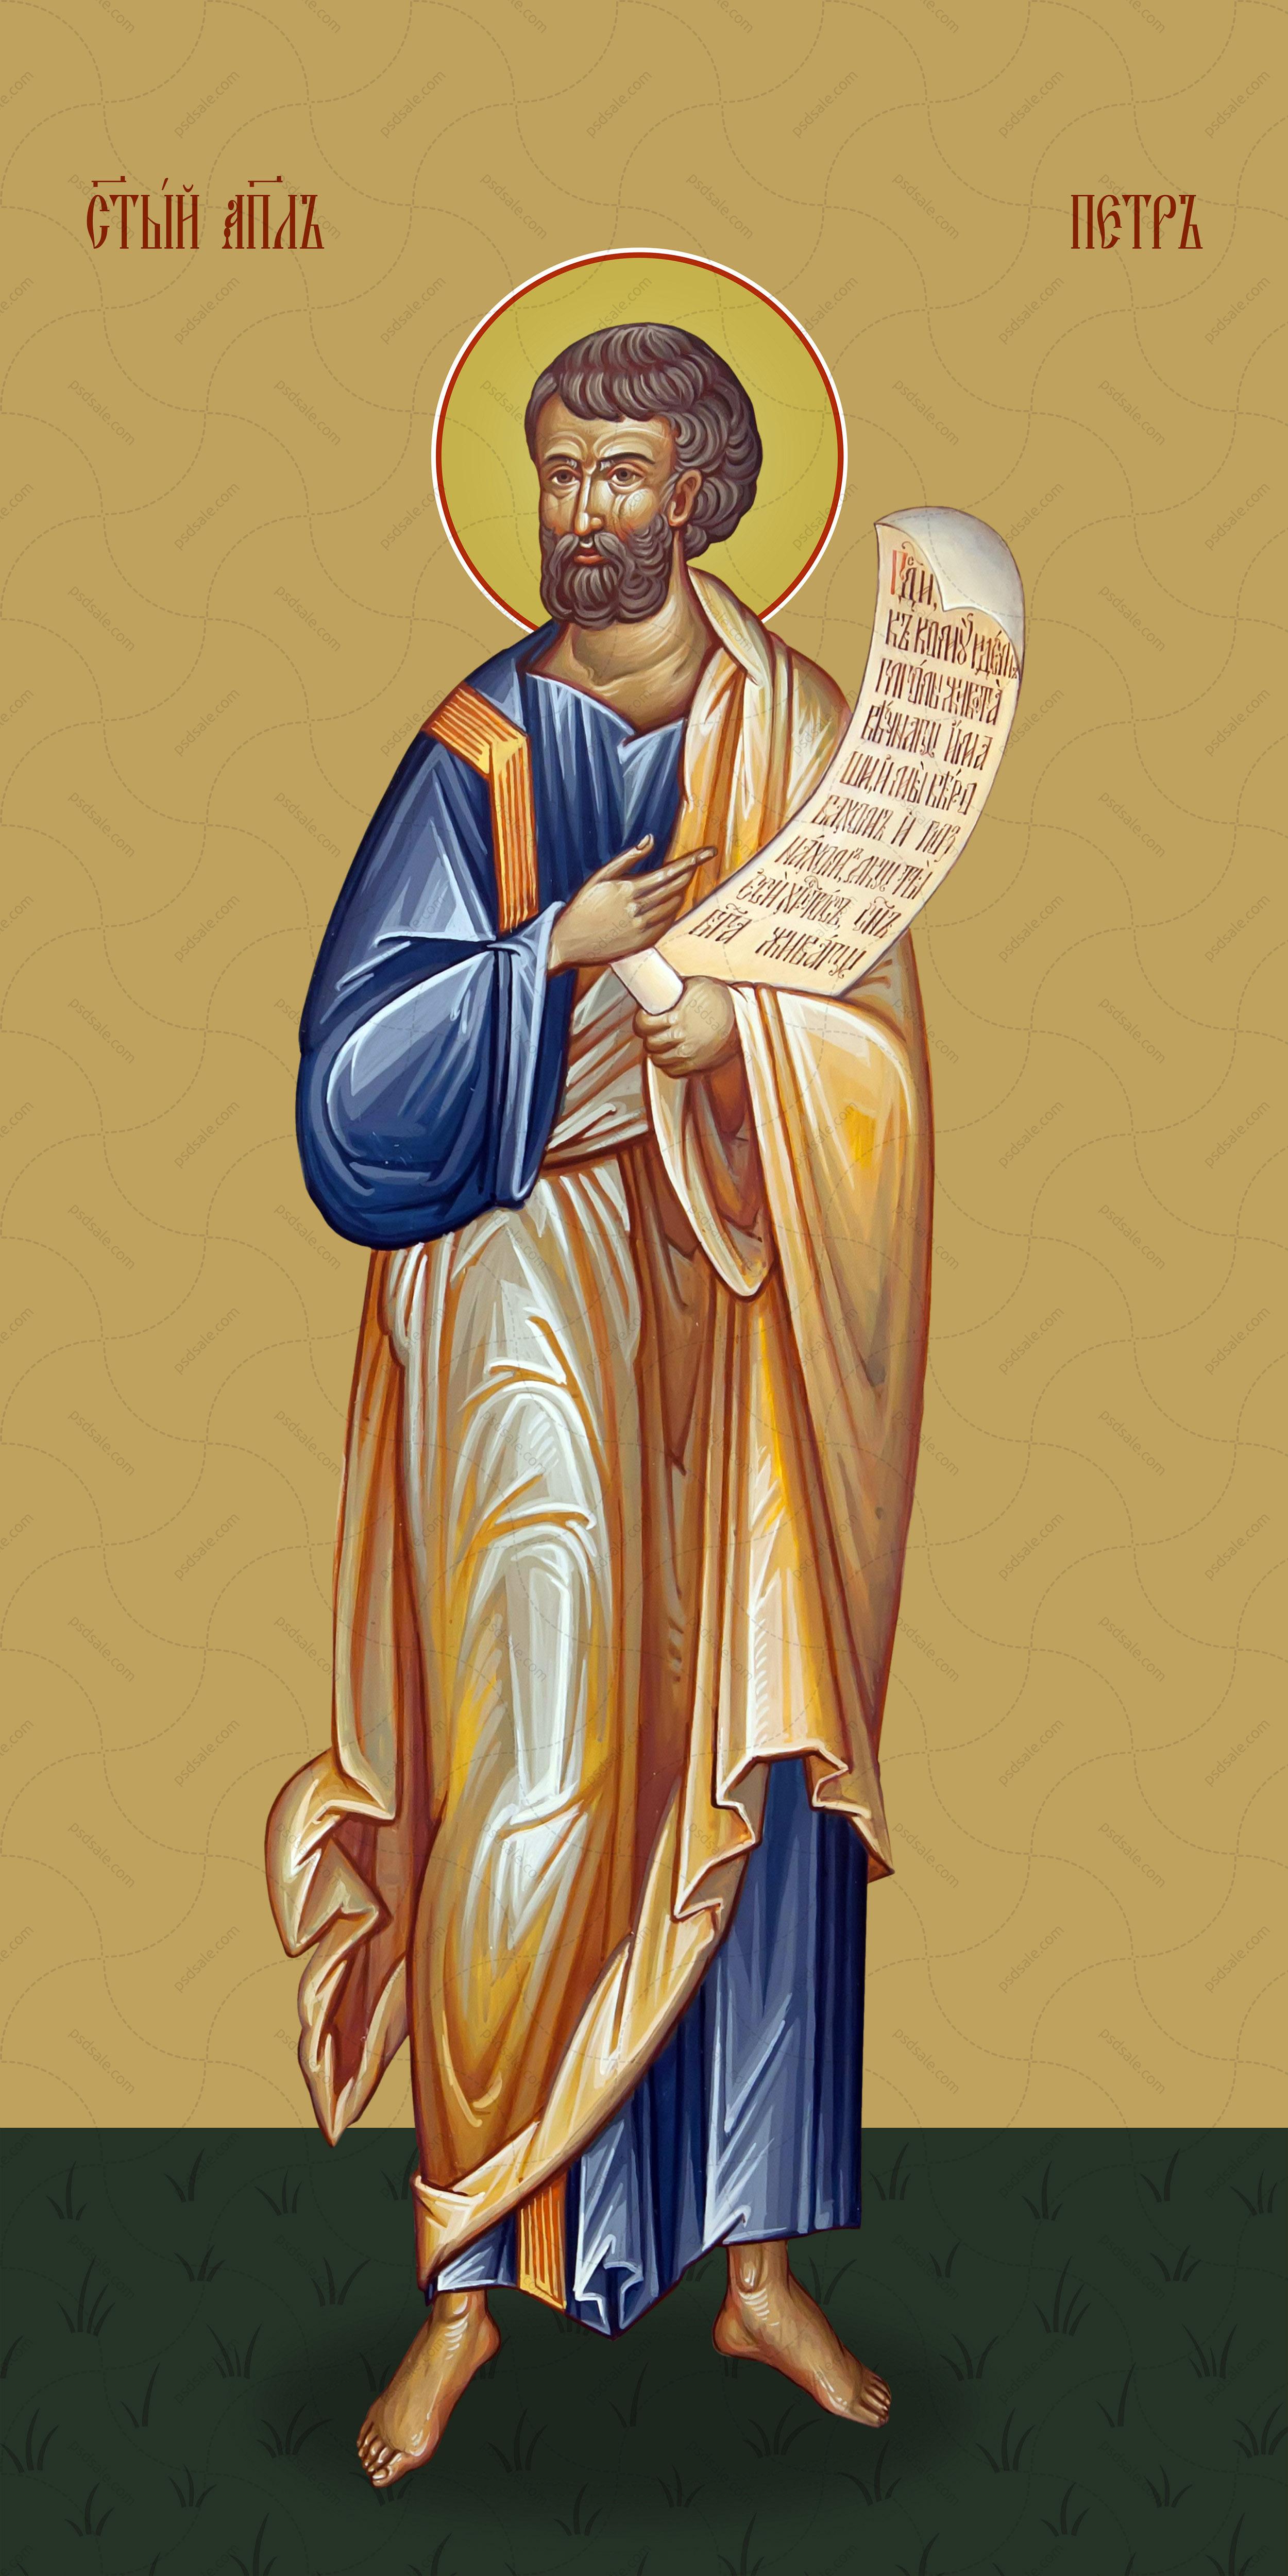 Мерная икона, Петр, святой апостол